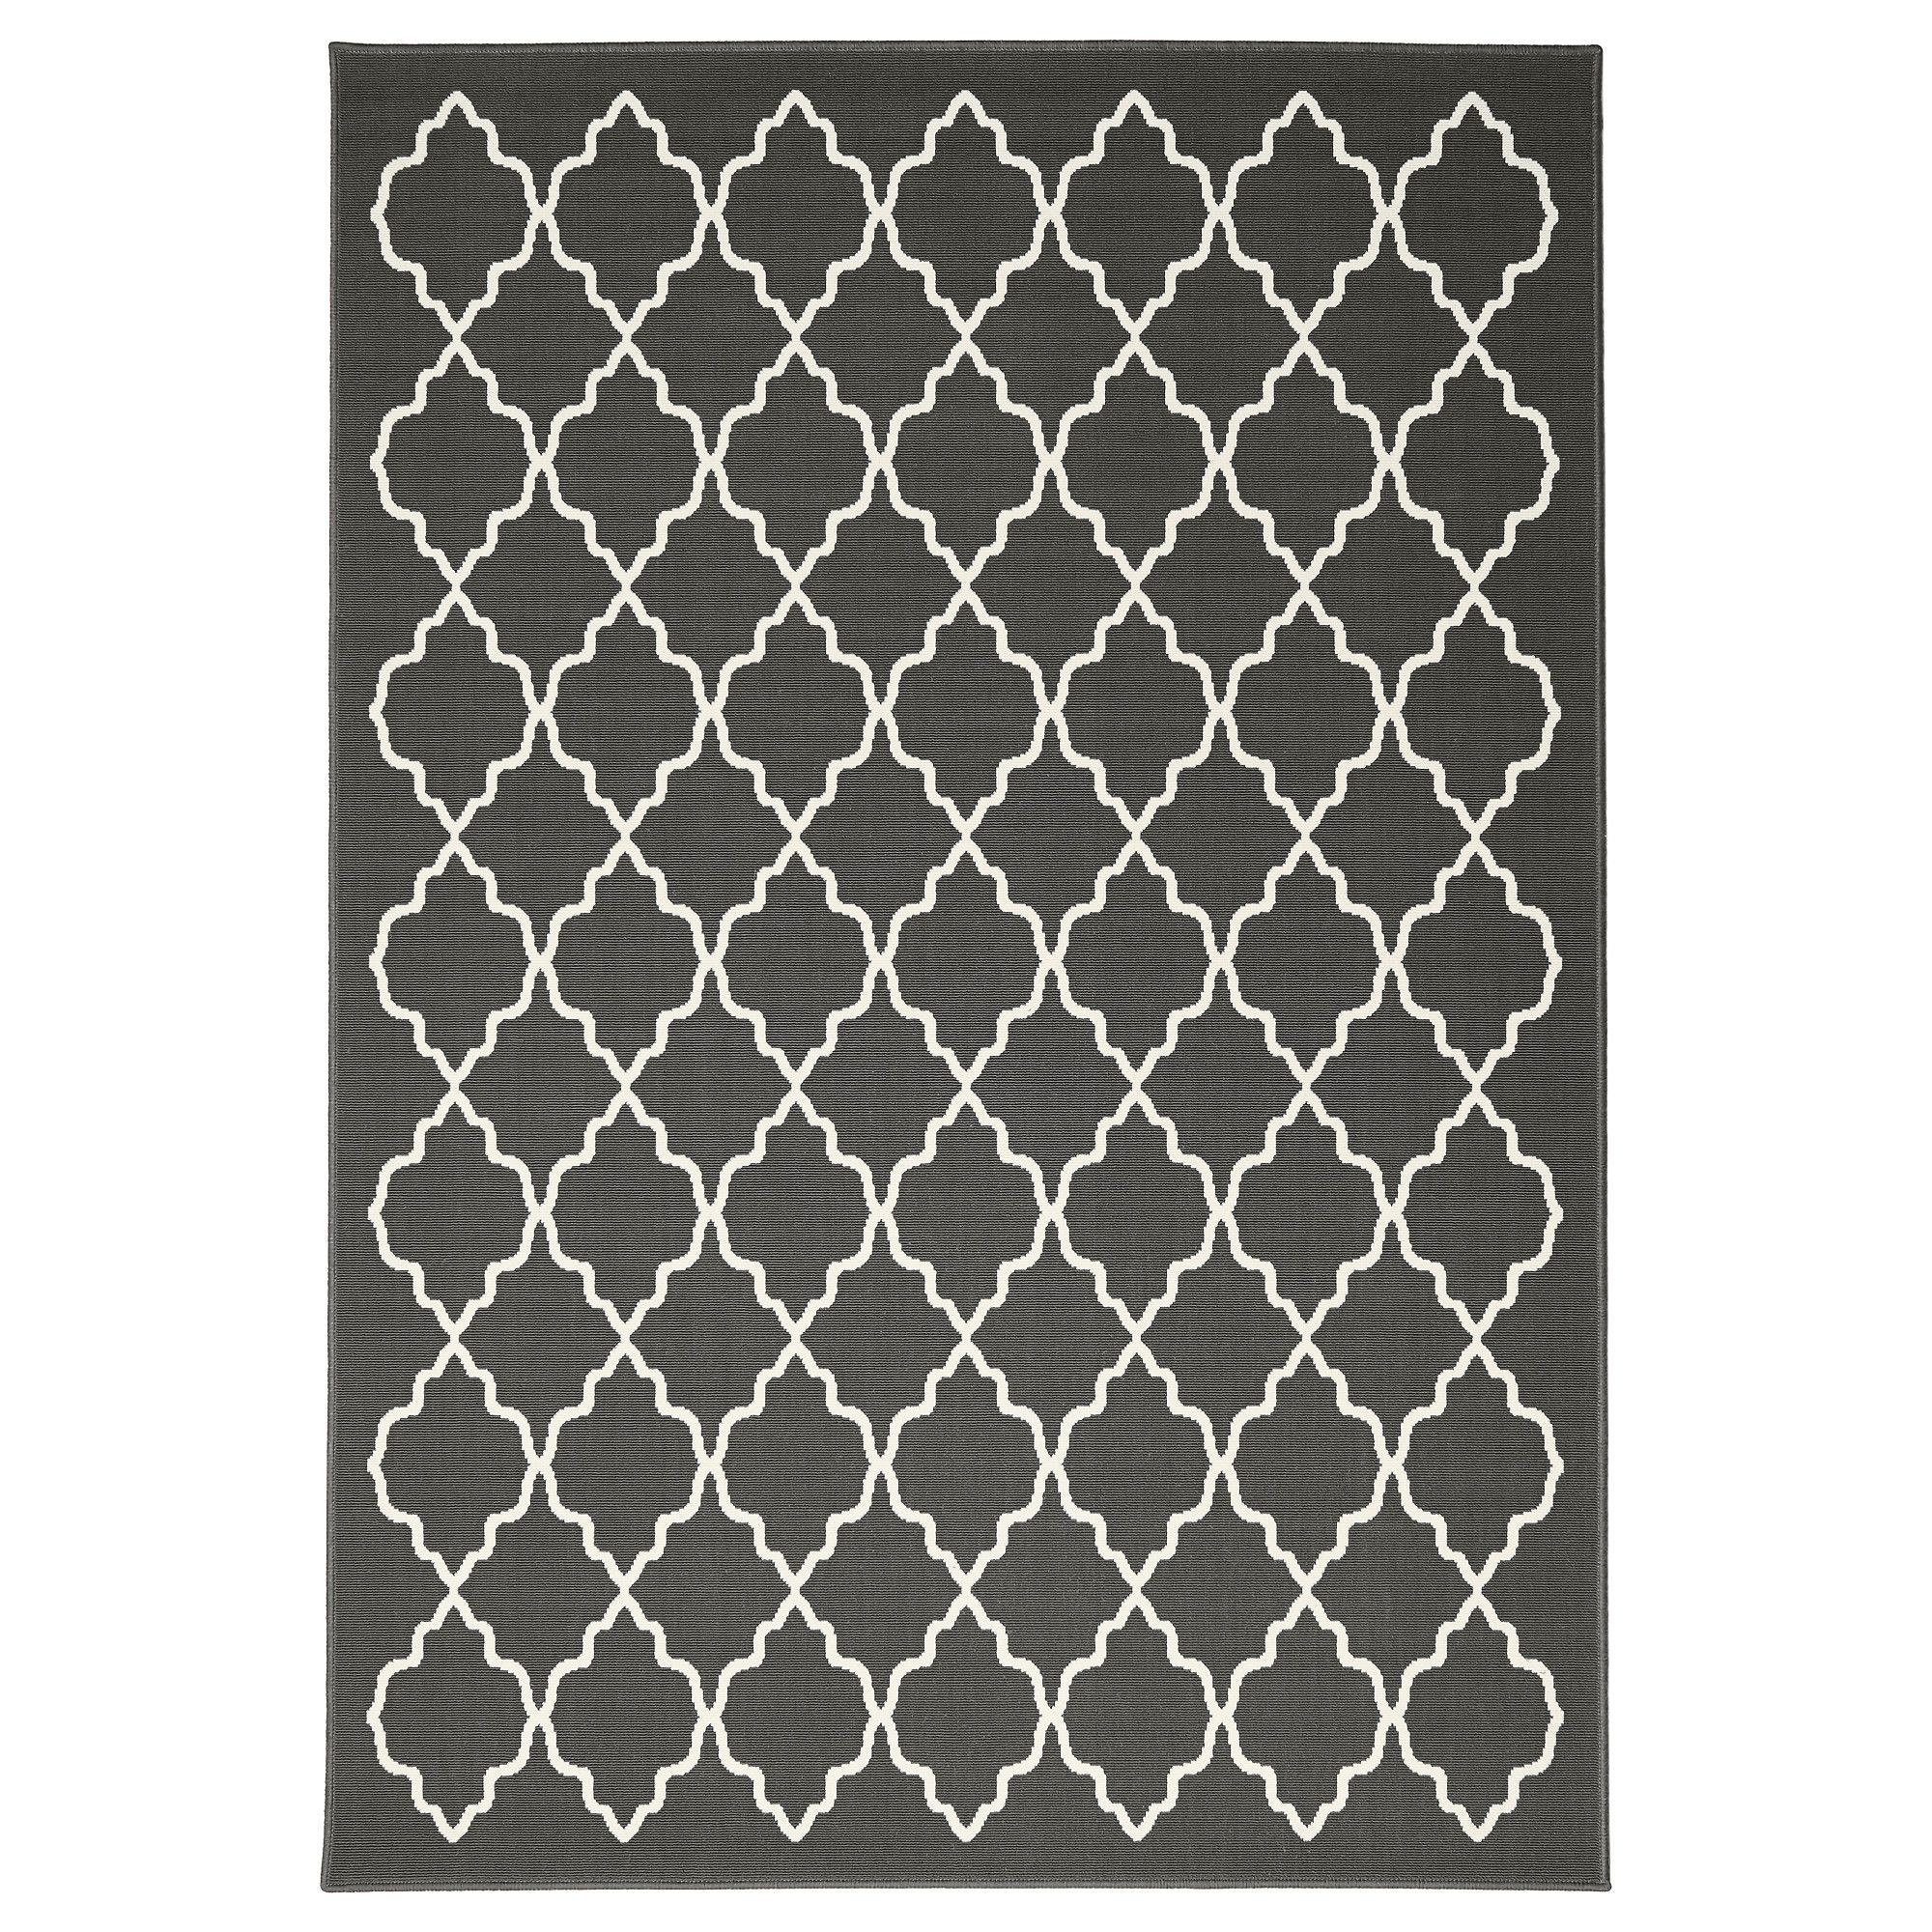 ikea hovslund tapis poils ras ce tapis en fibres. Black Bedroom Furniture Sets. Home Design Ideas